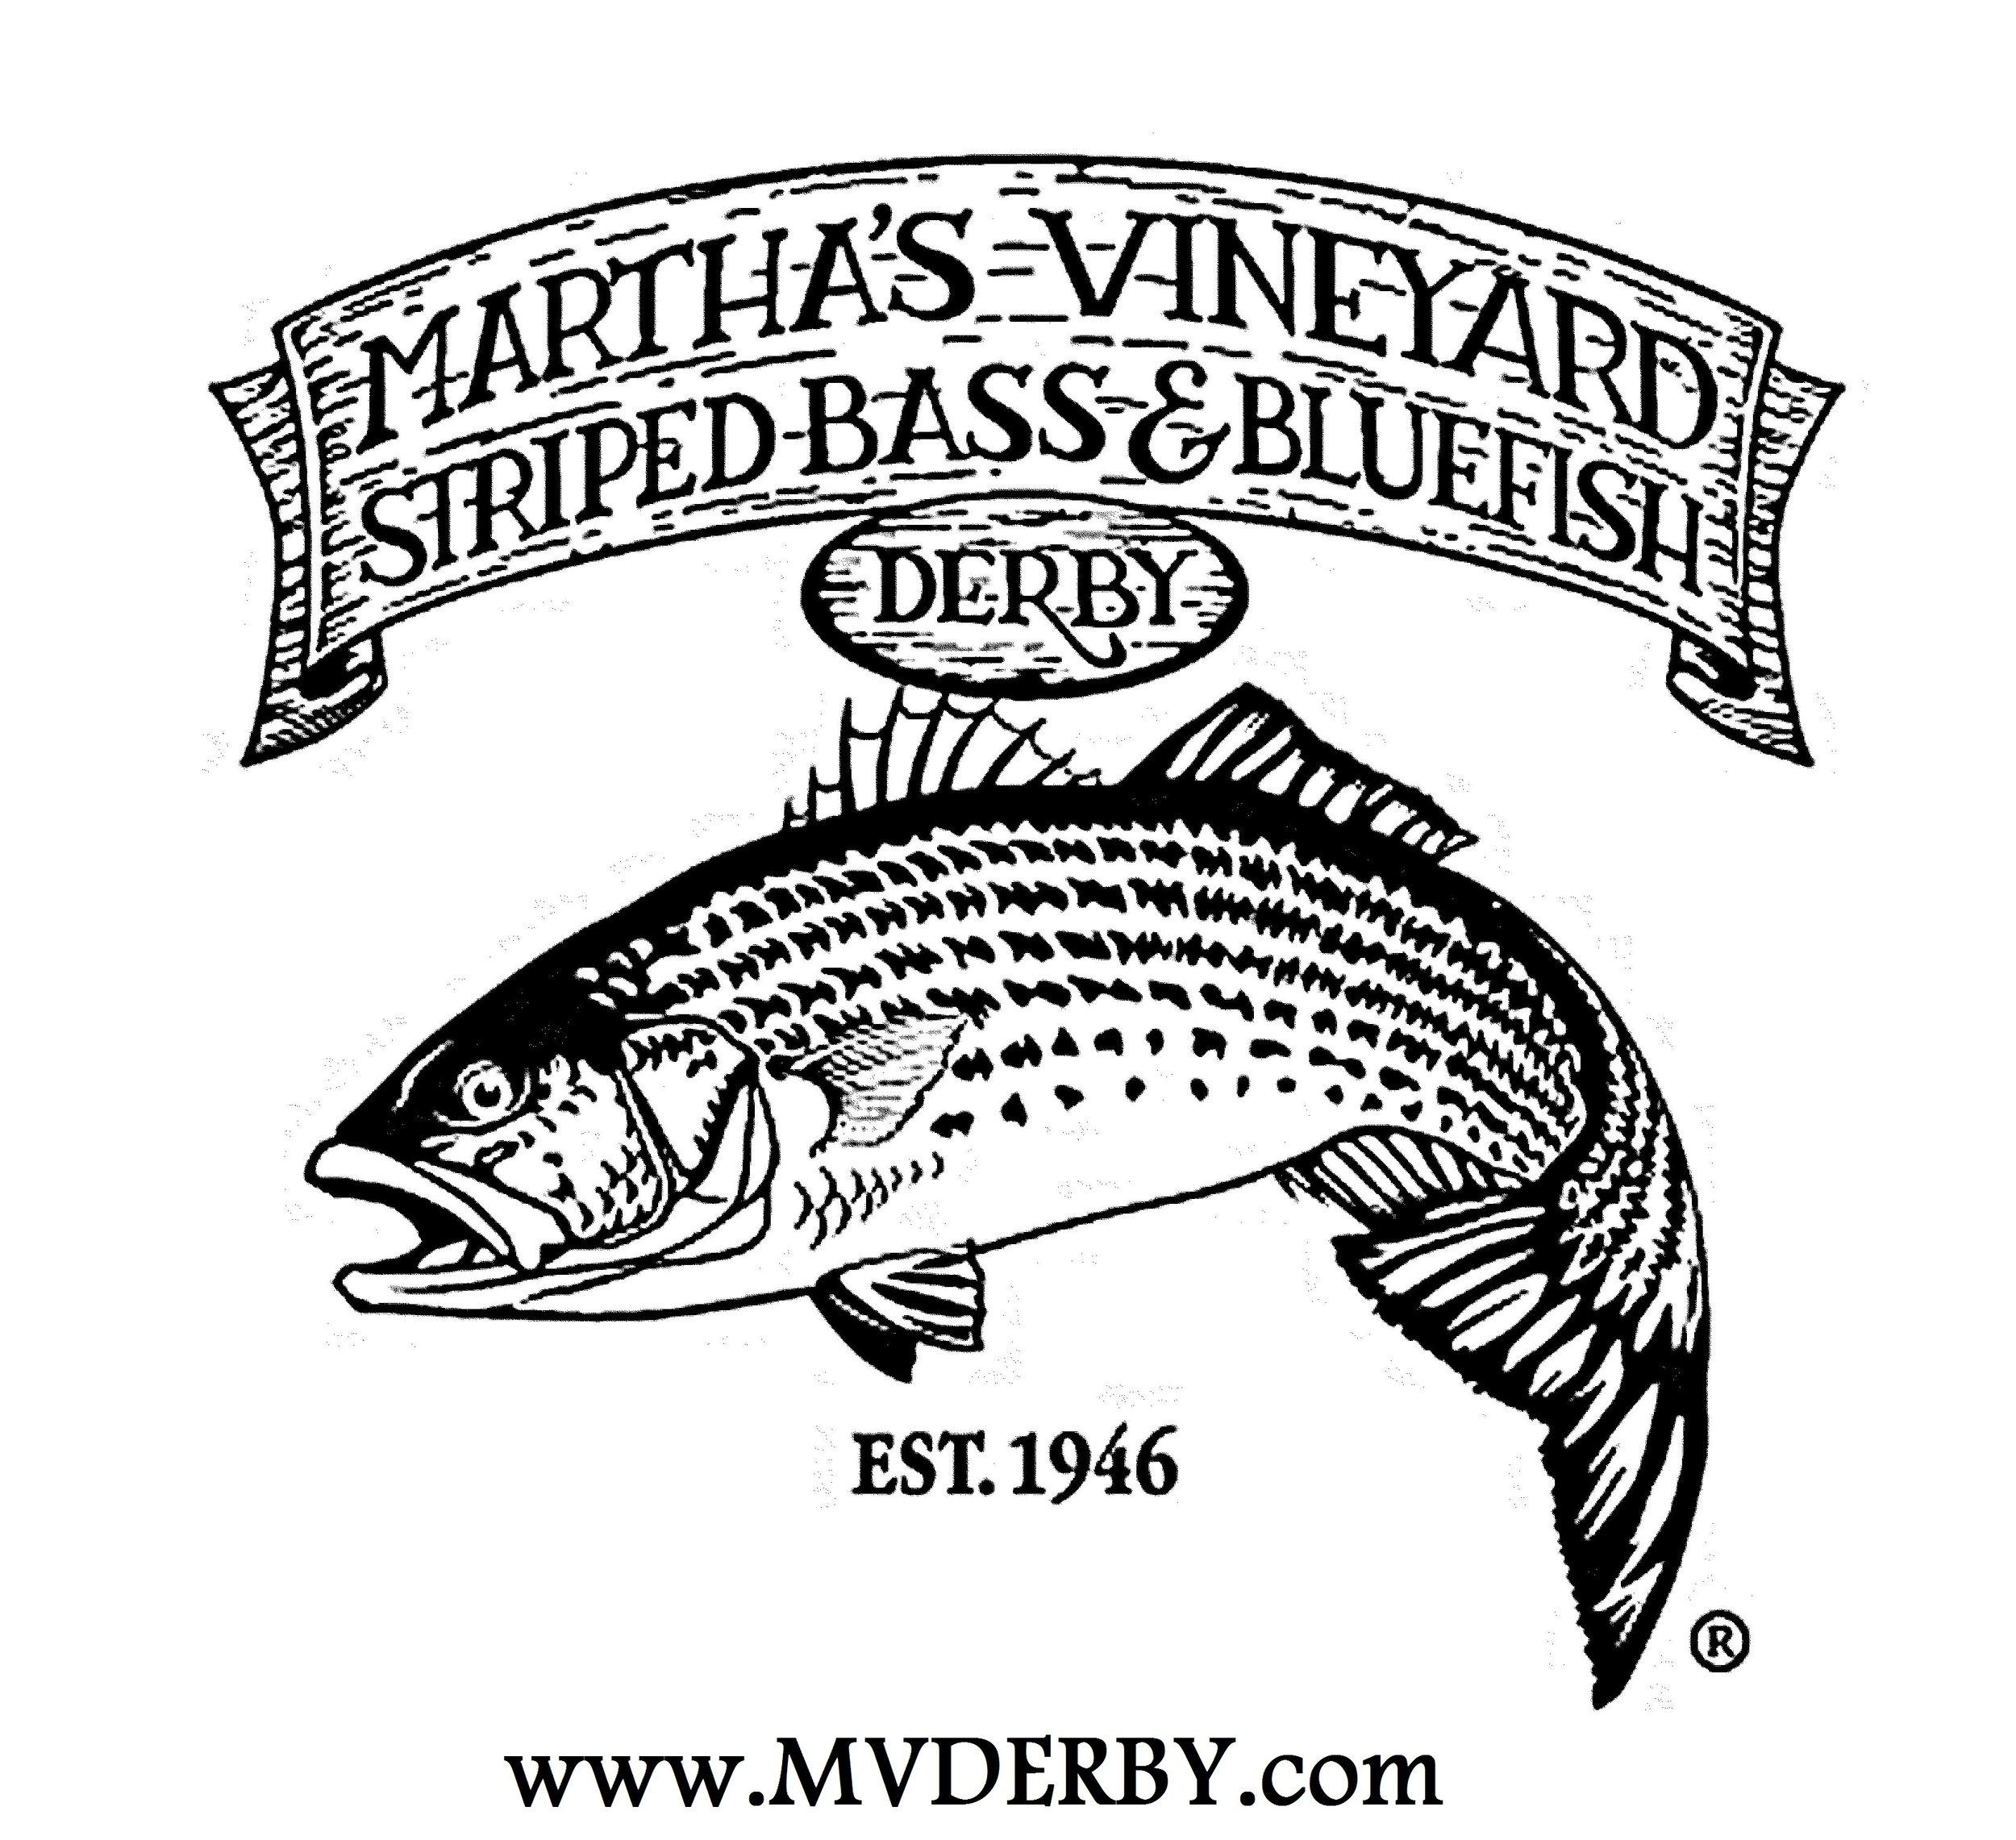 MVSB&BDerby logo WITH WEBSITE.jpg